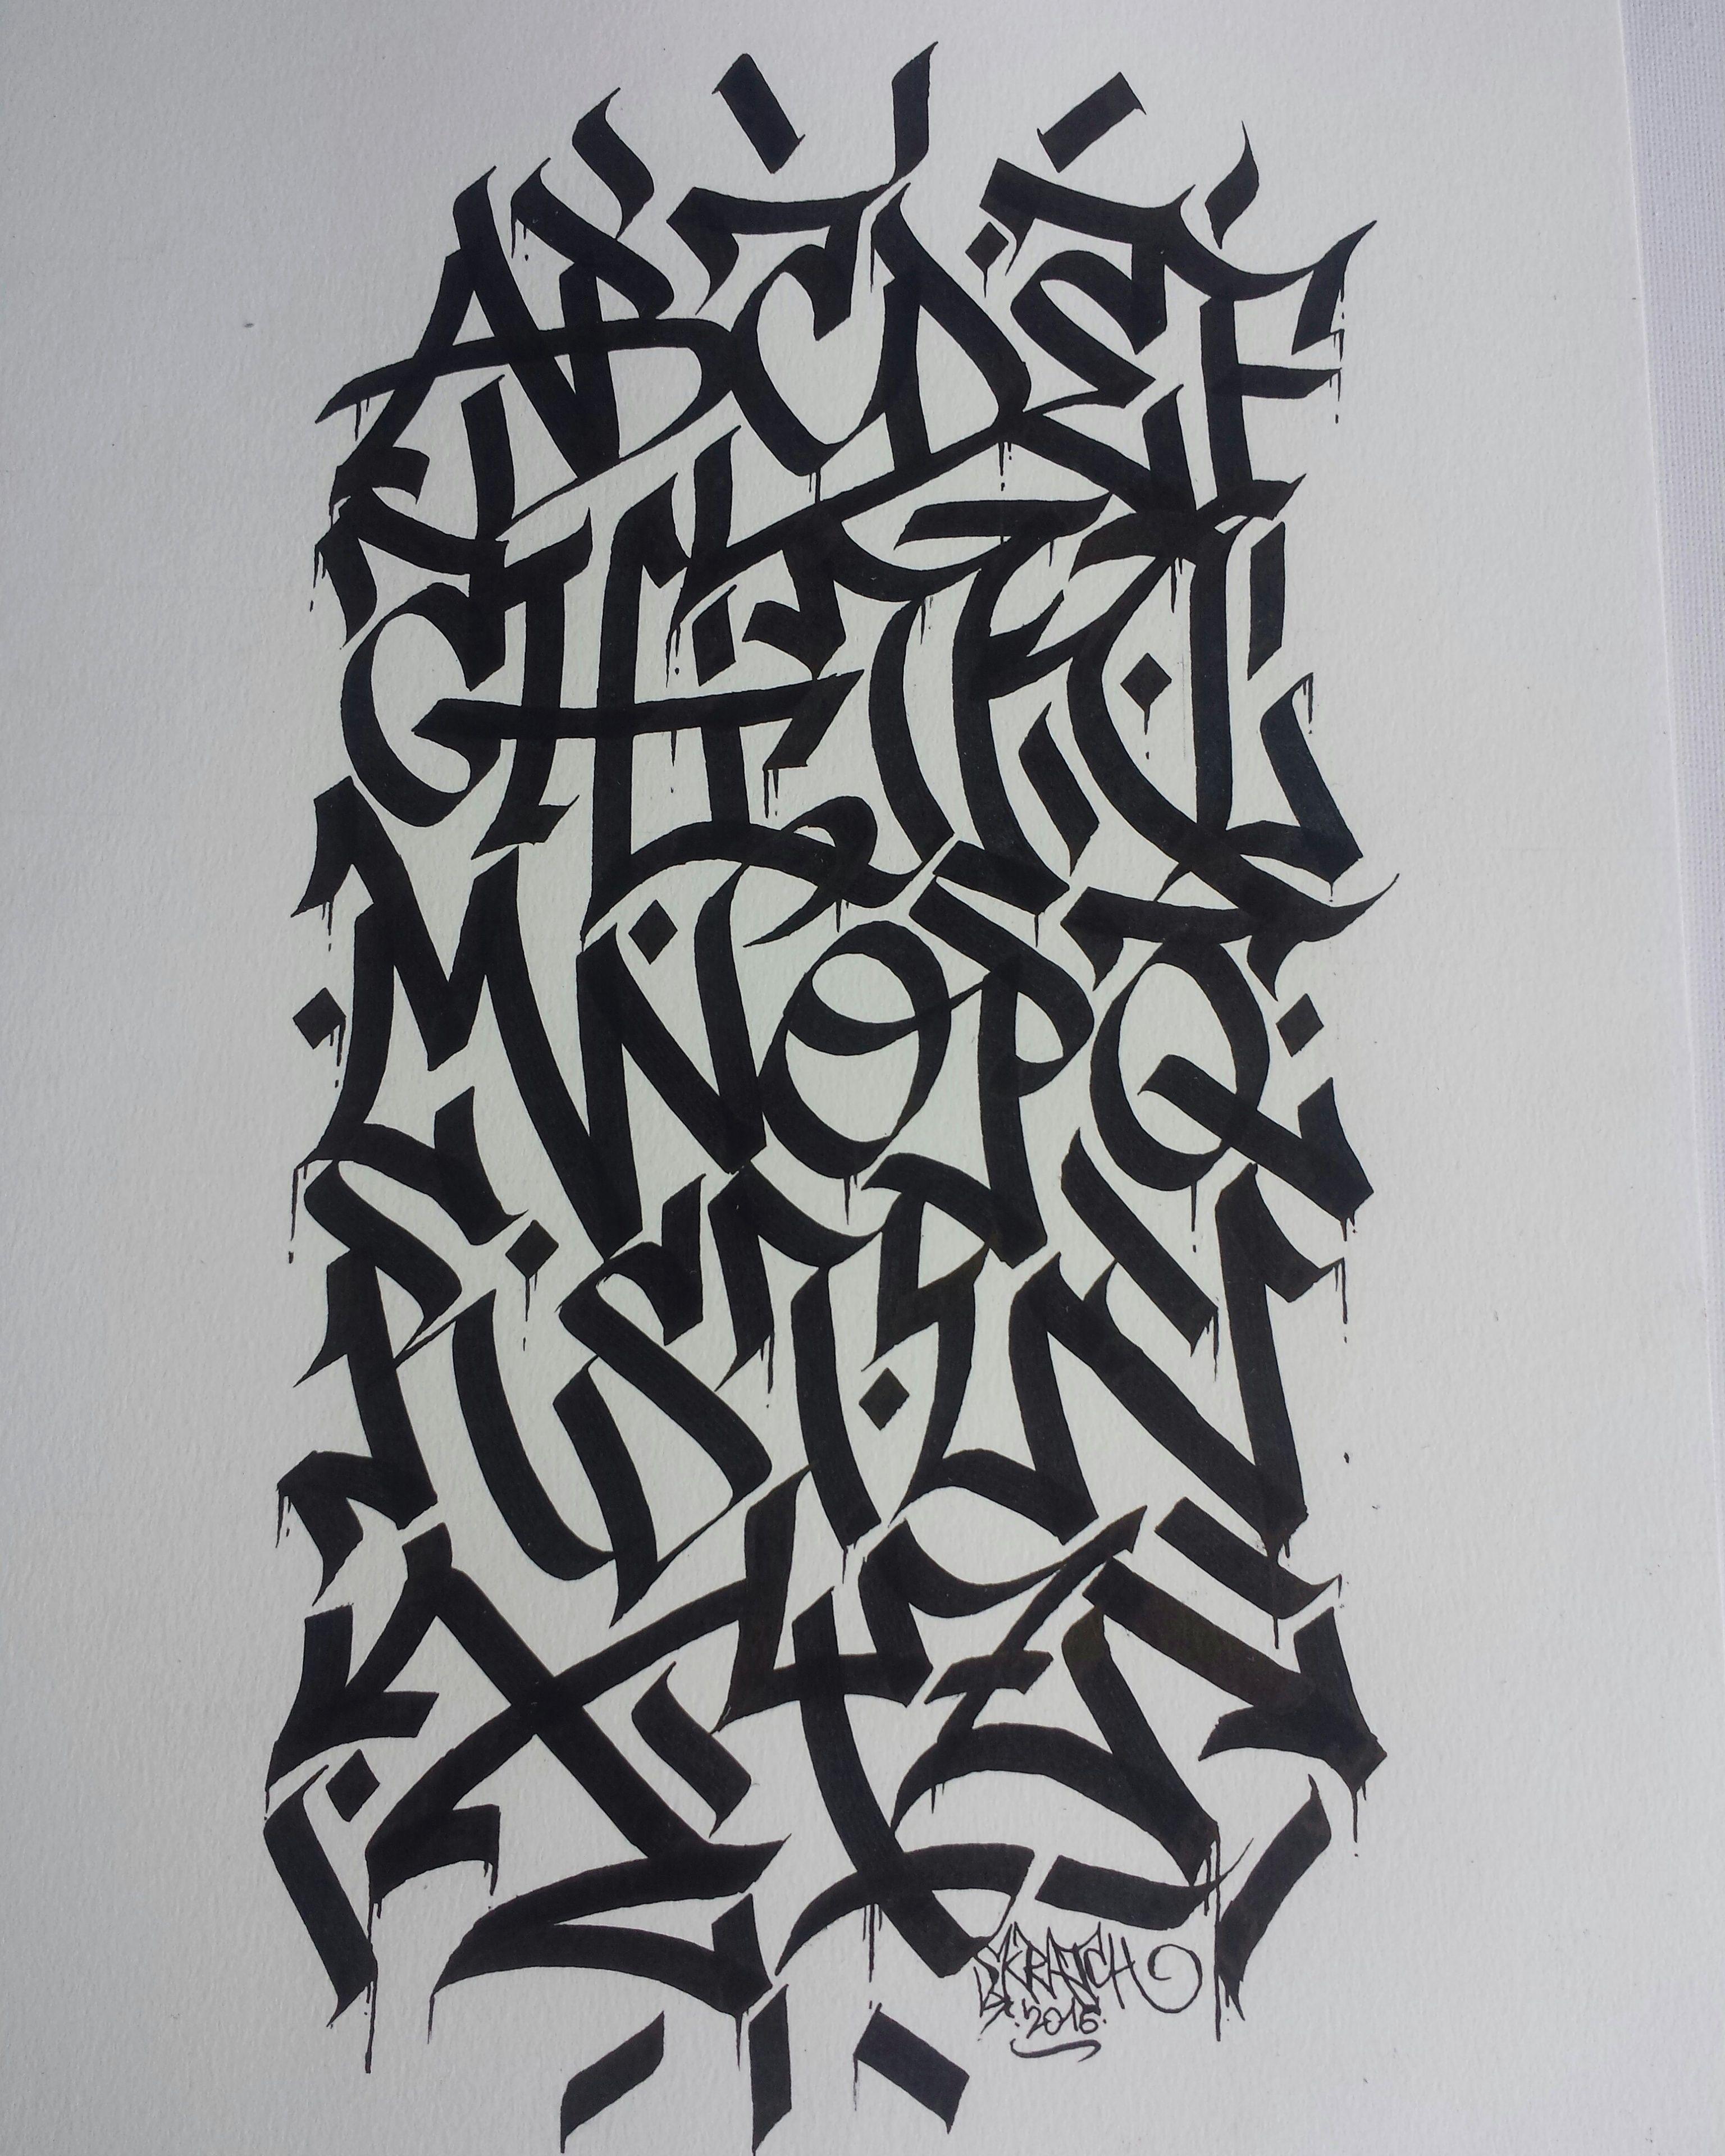 Alphabet calligraffiti by skratch 2016 calligraphy calligraffiti en 2019 lettrage graffiti - Lettre graffiti modele ...